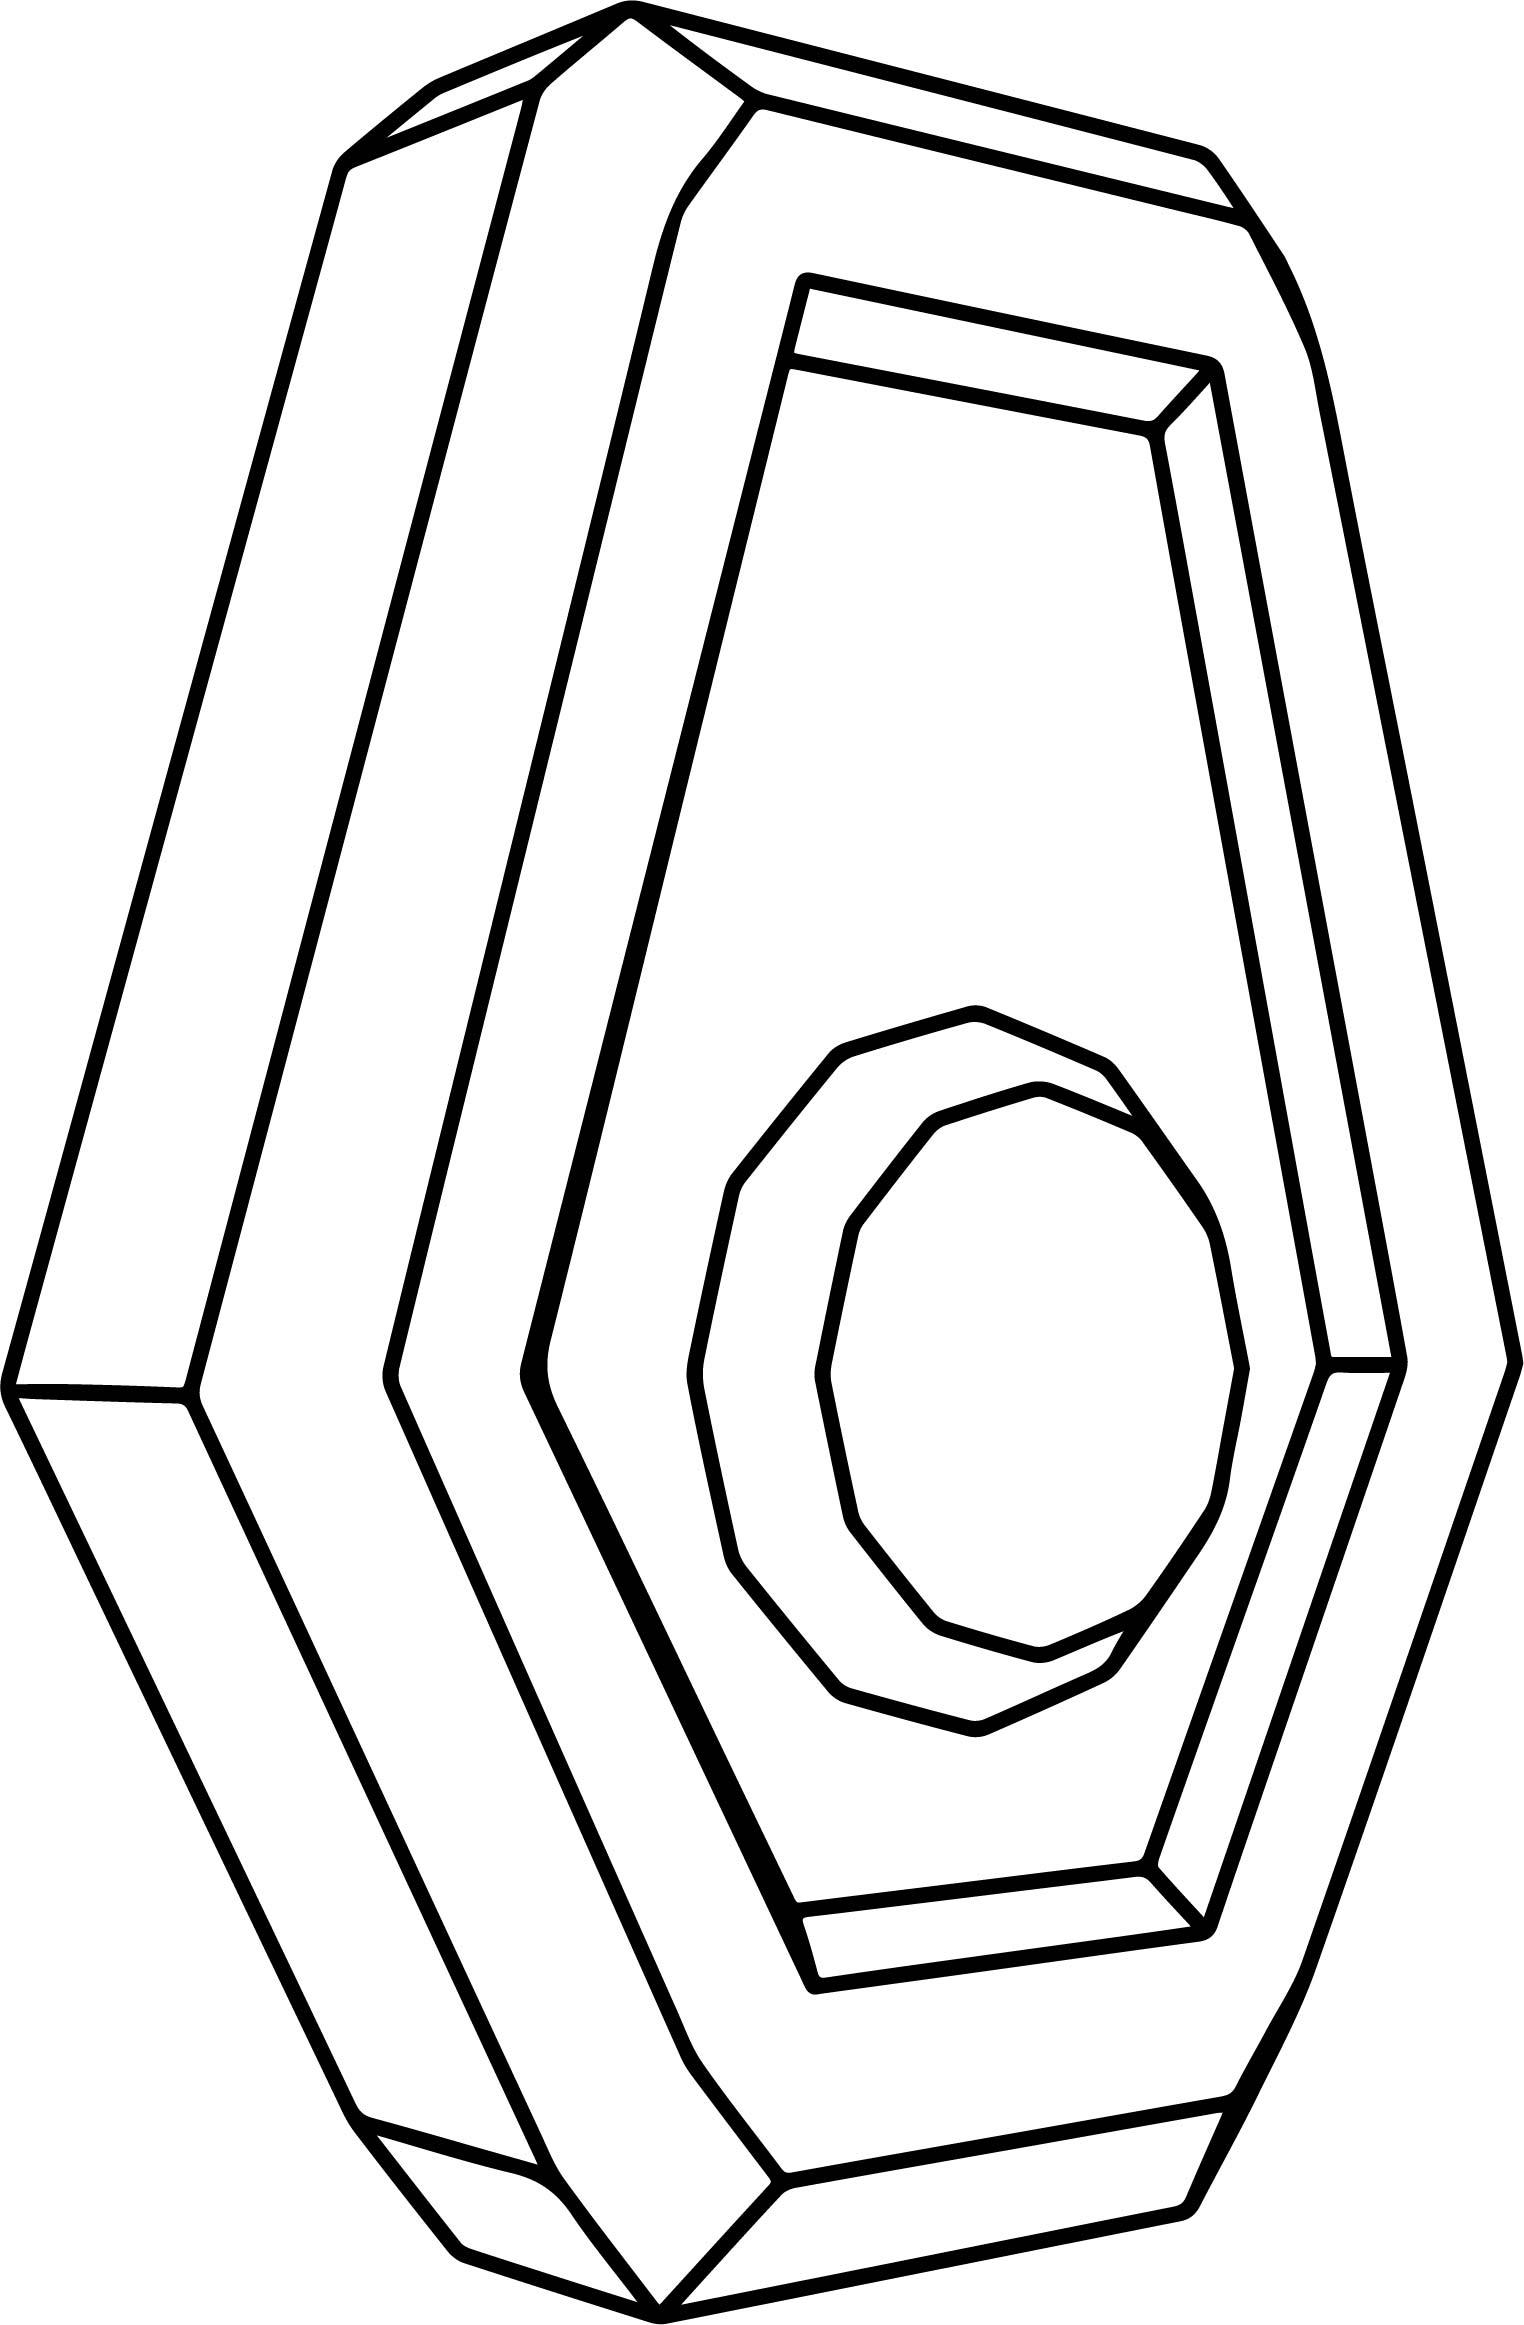 Batarang Device Coloring Page | Wecoloringpage.com